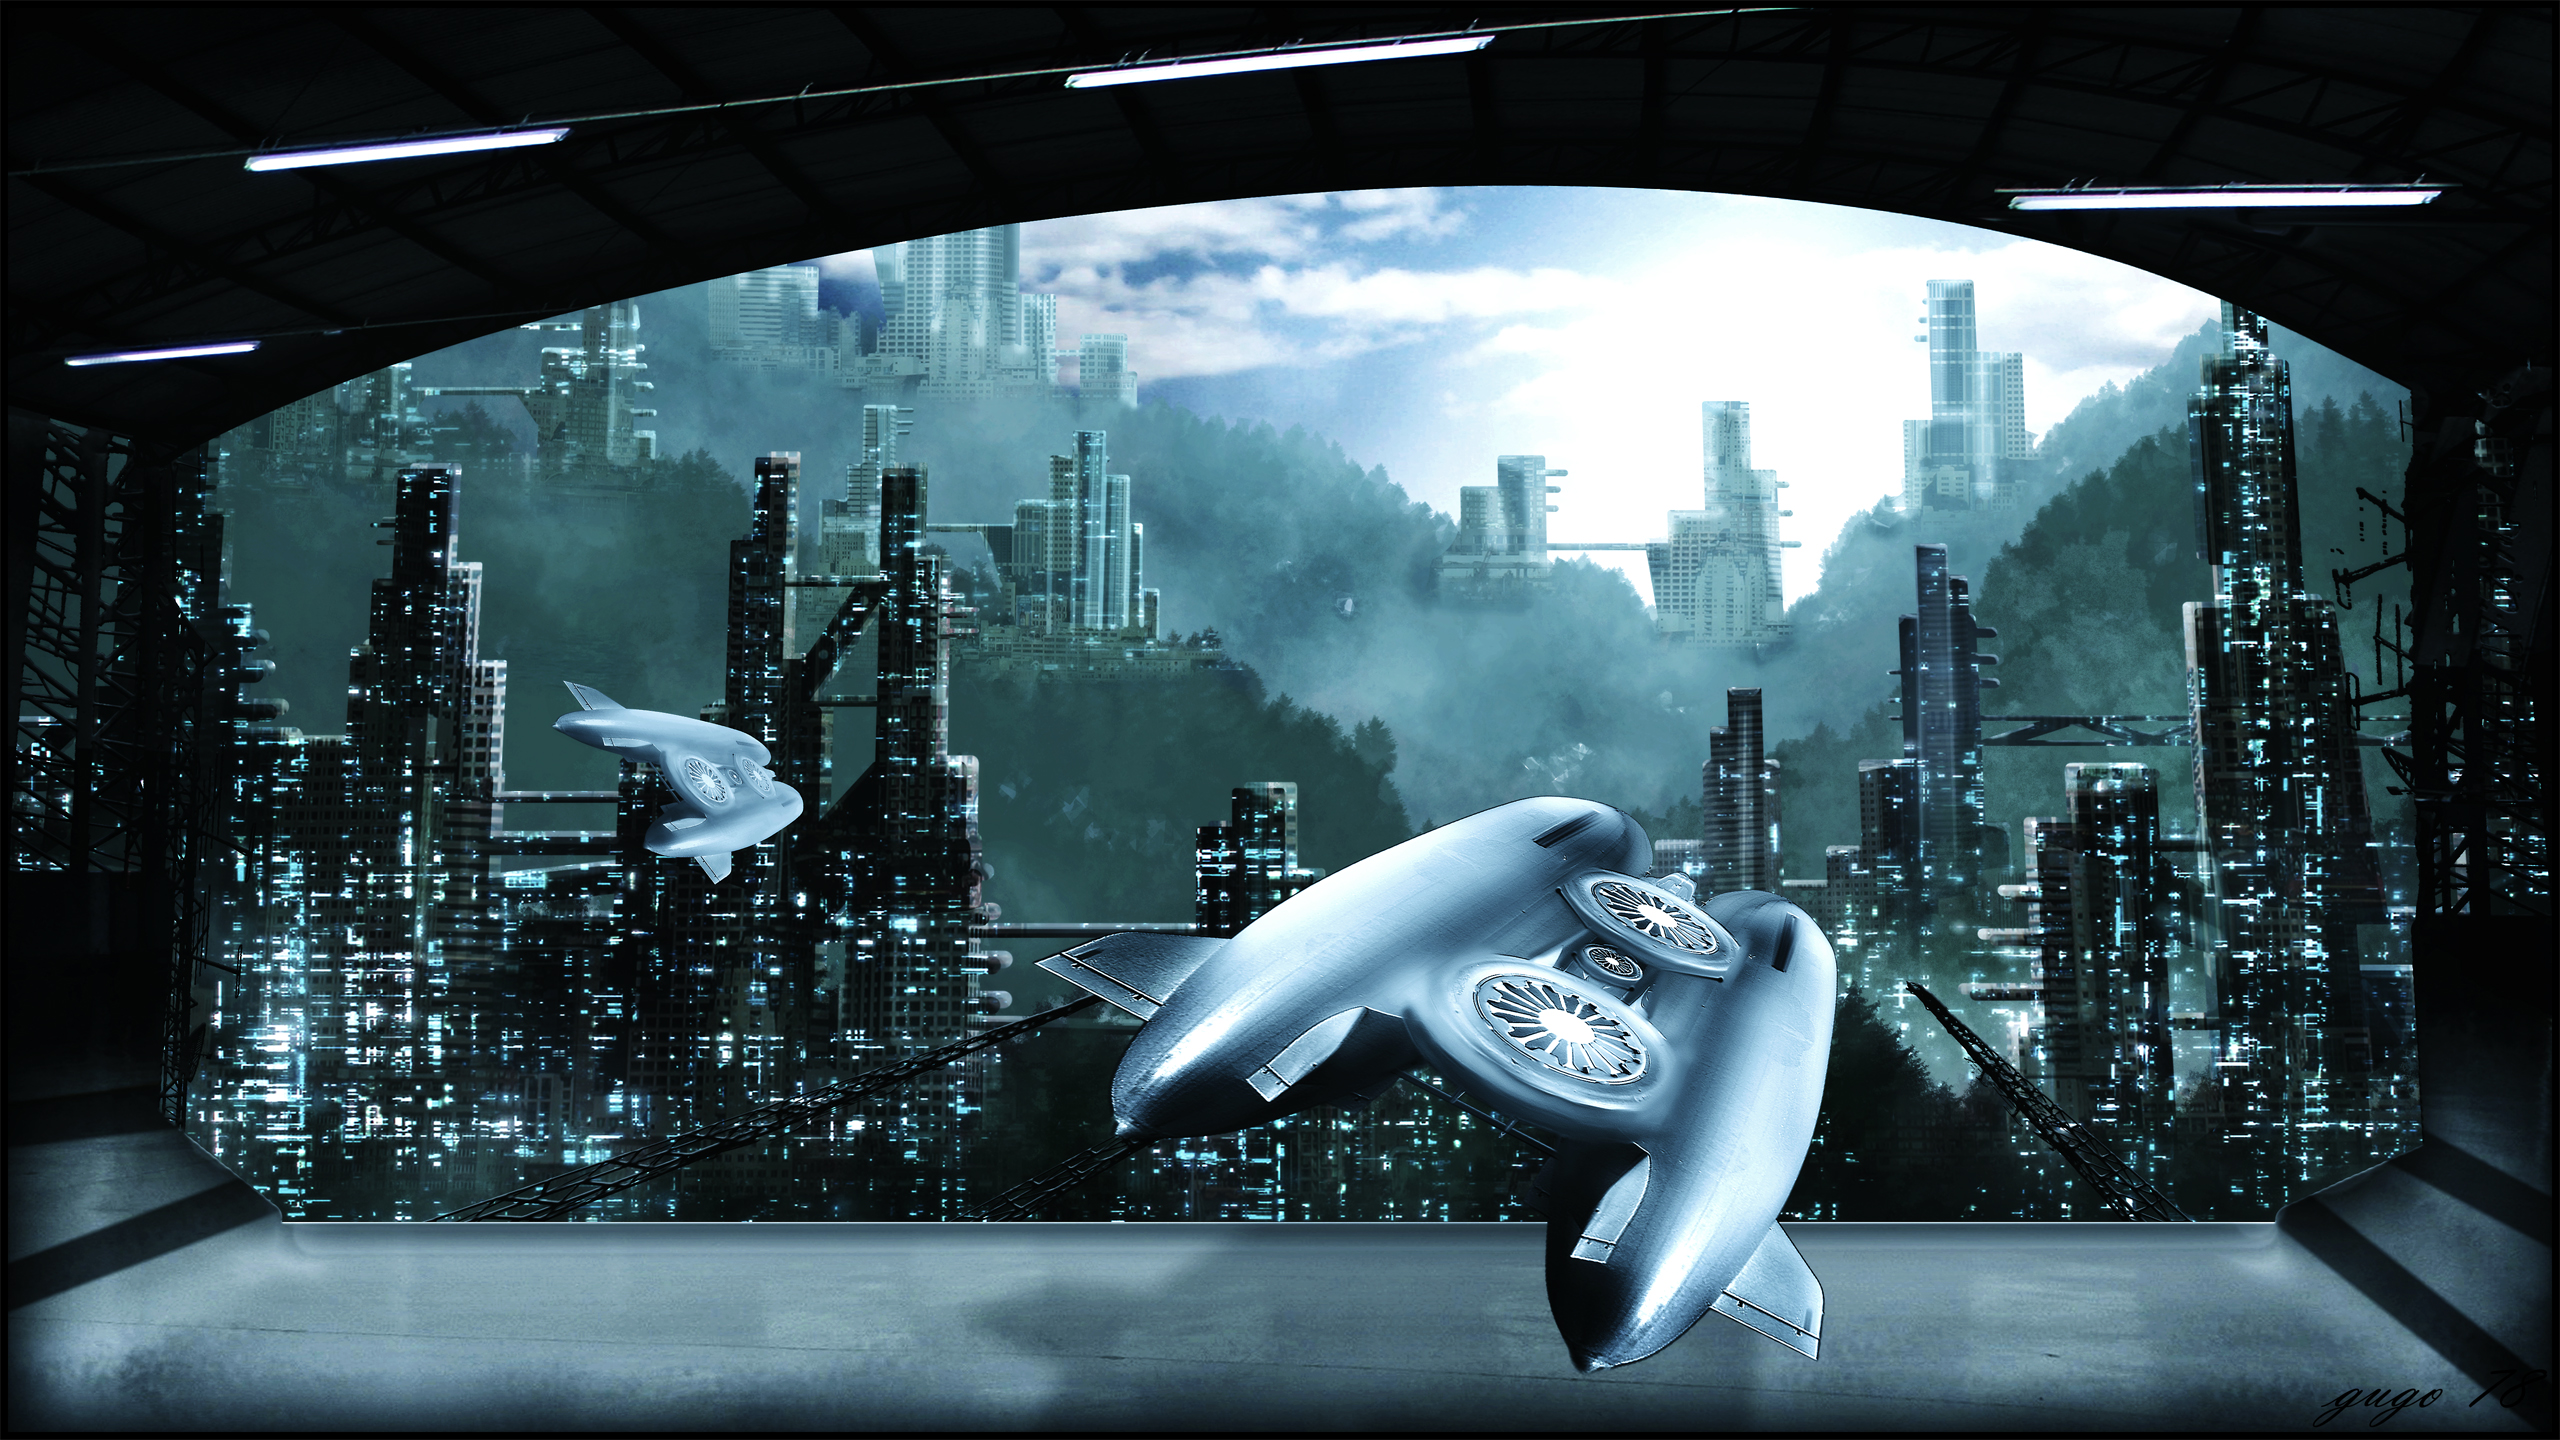 Sci Fi Wallpaper 2560x1440: City HD Wallpaper